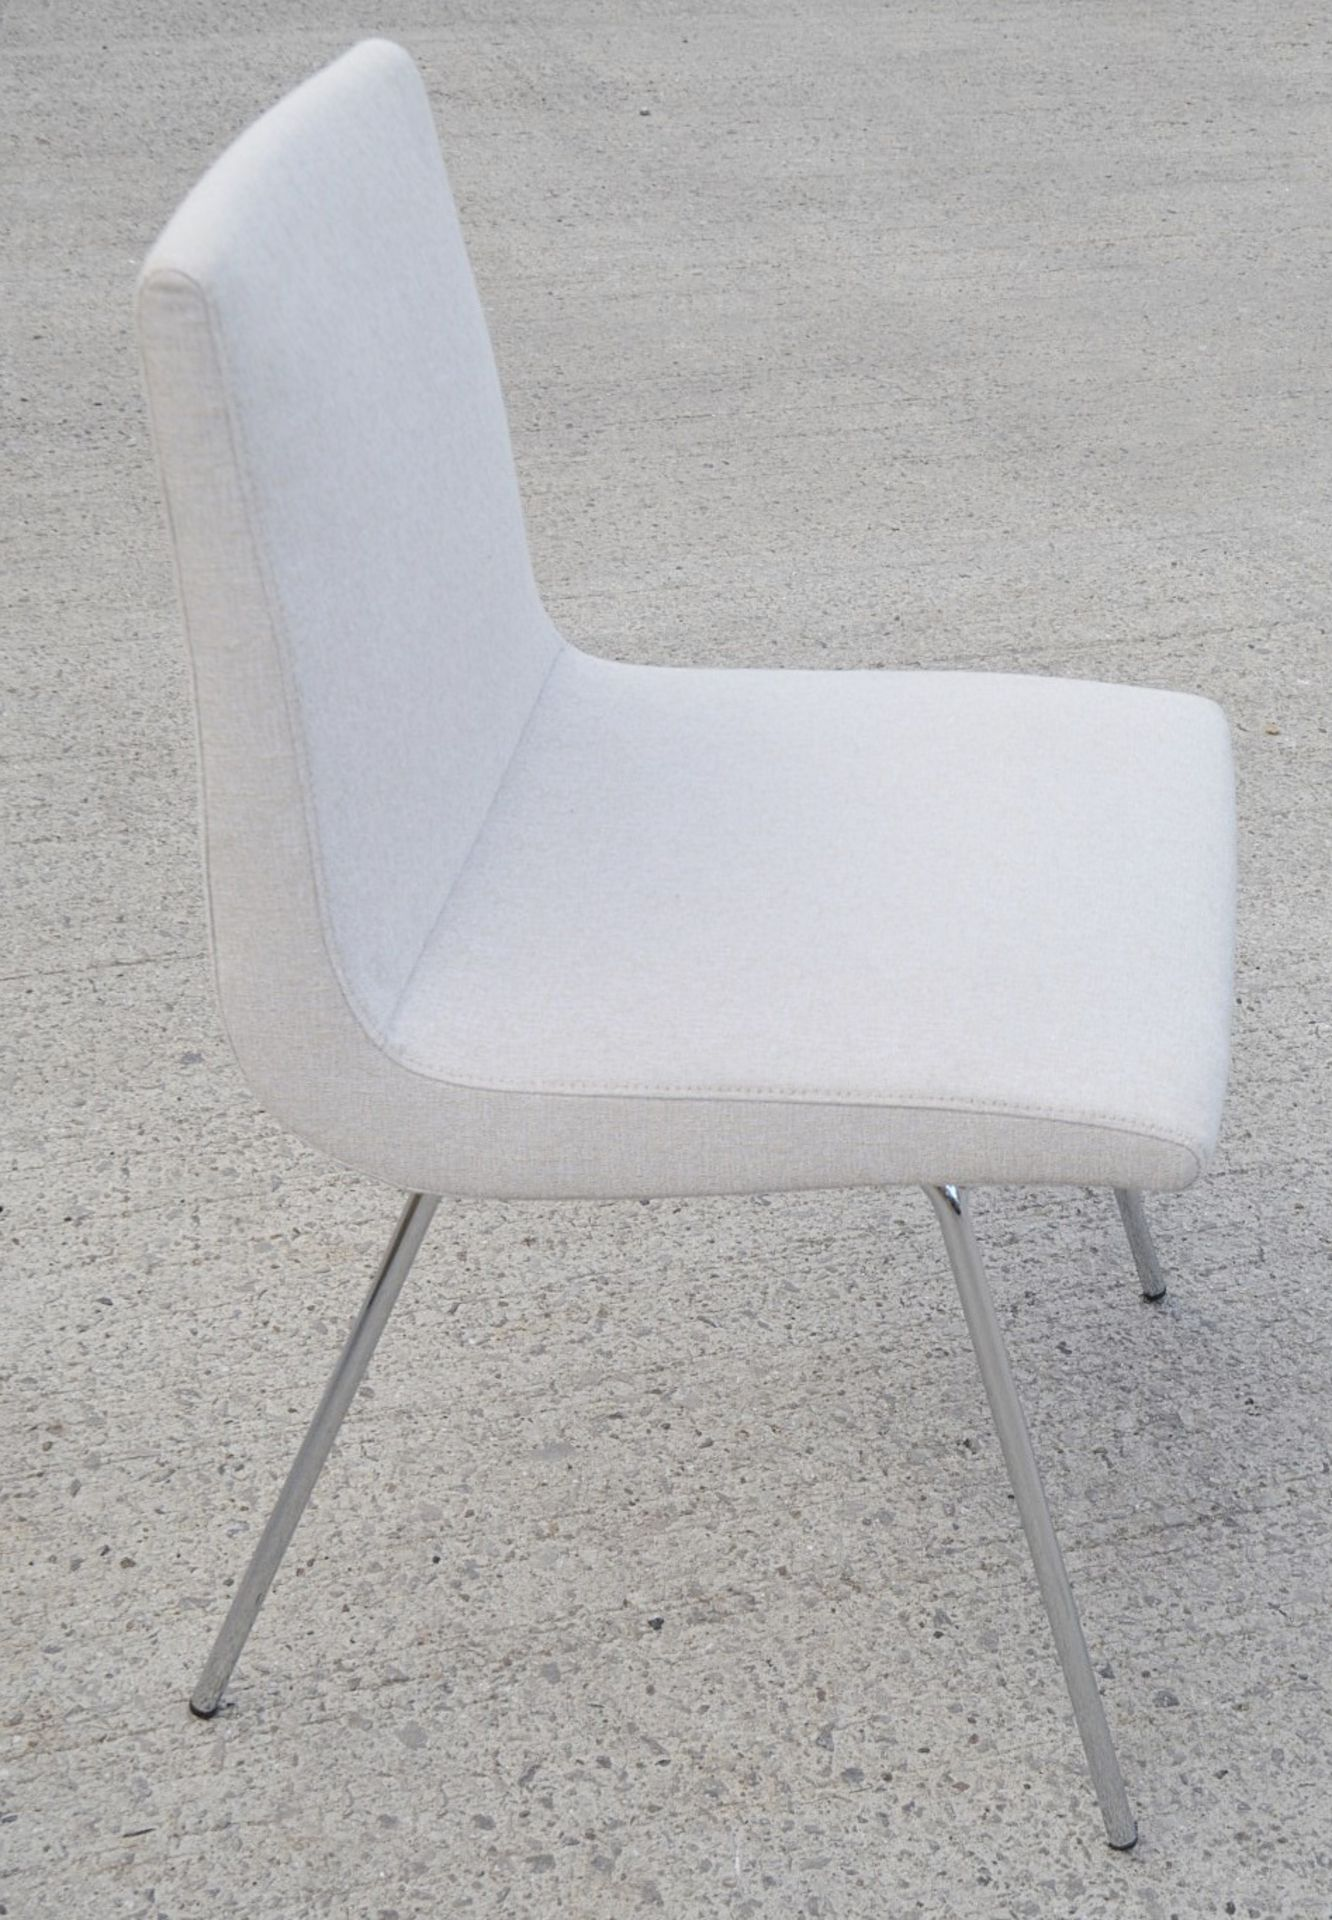 Pair Of LIGNE ROSET 'TV' Designer Dining Chairs In A Light Neutral Beige Fabric & Chromed Steel Legs - Image 5 of 9